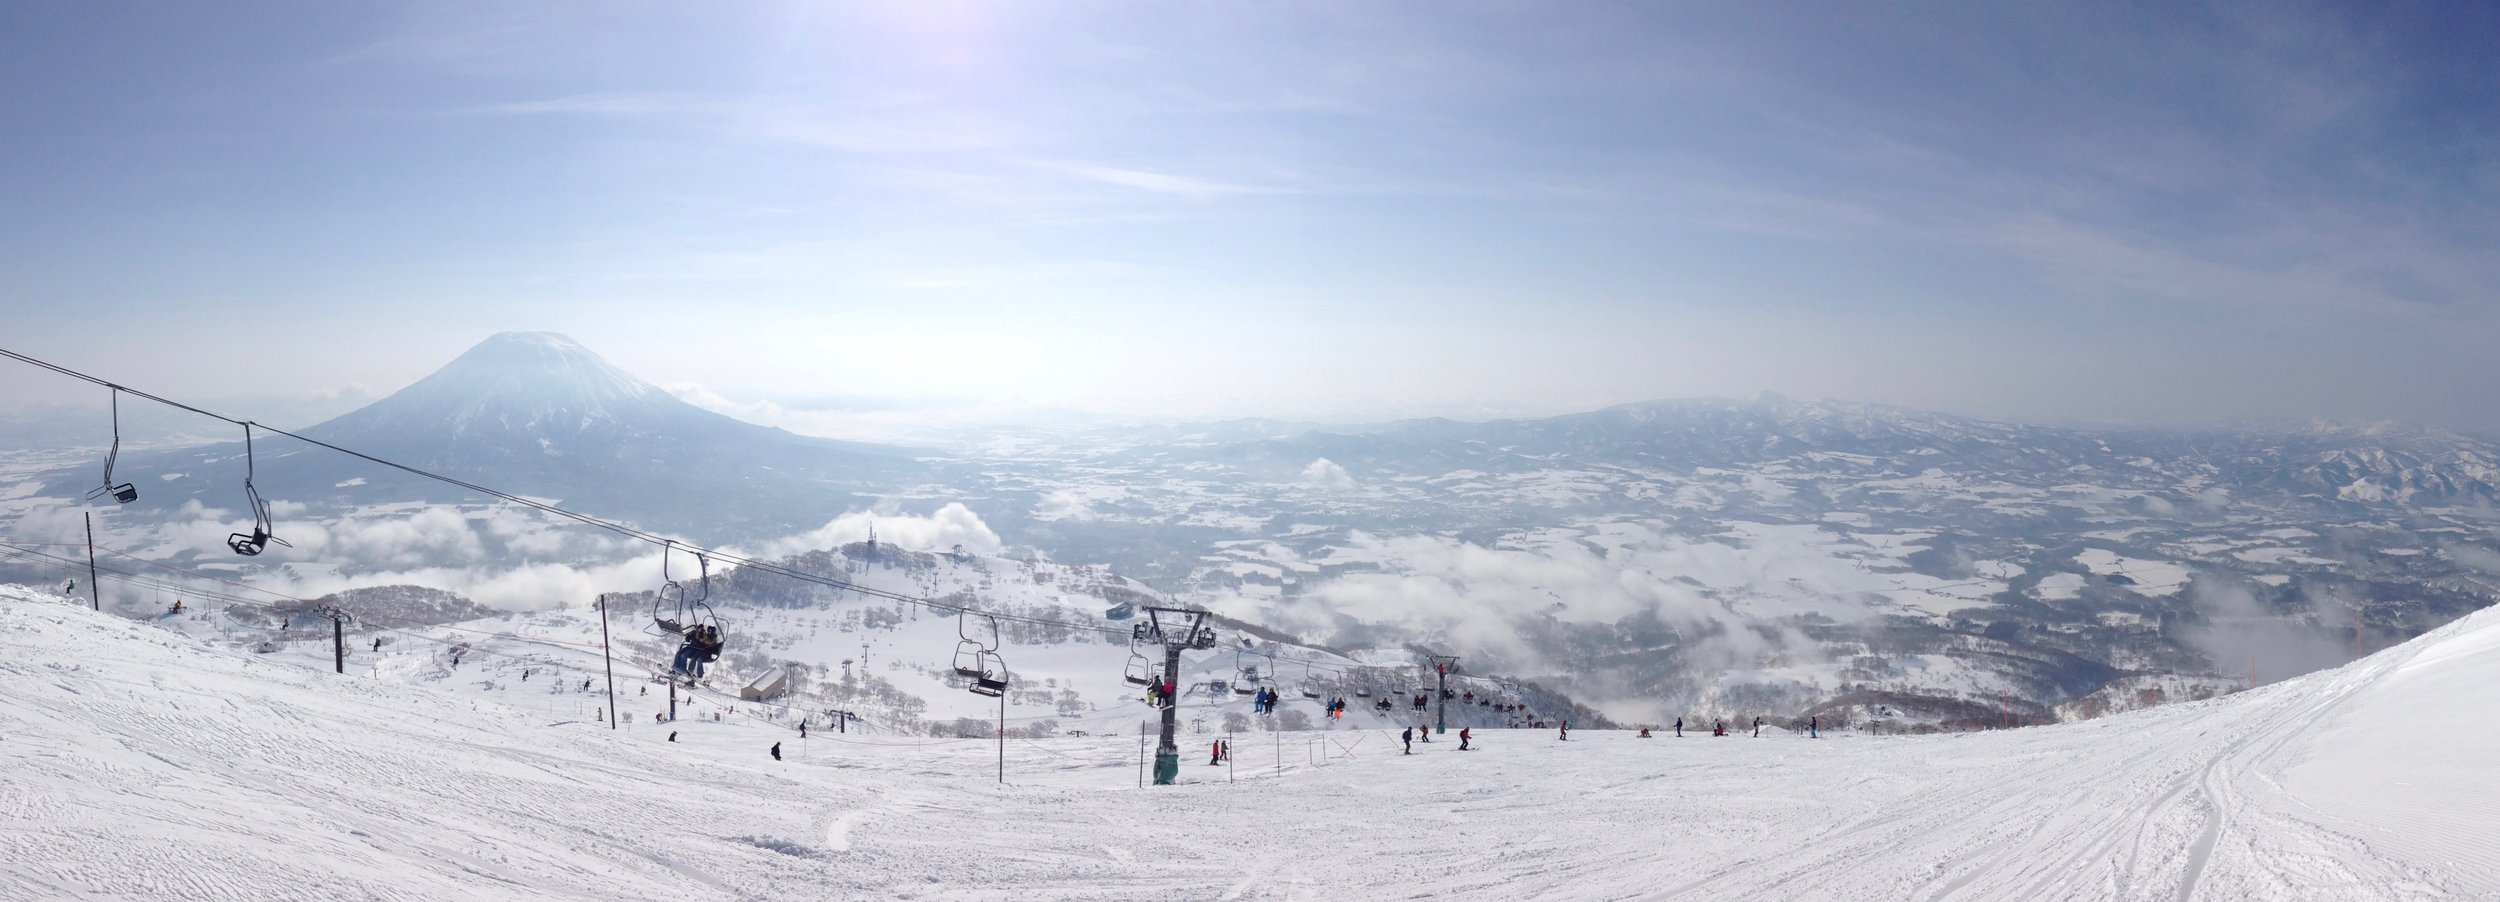 Mt Annapuri, Looking to Mt Yotei, Niseko, Japan